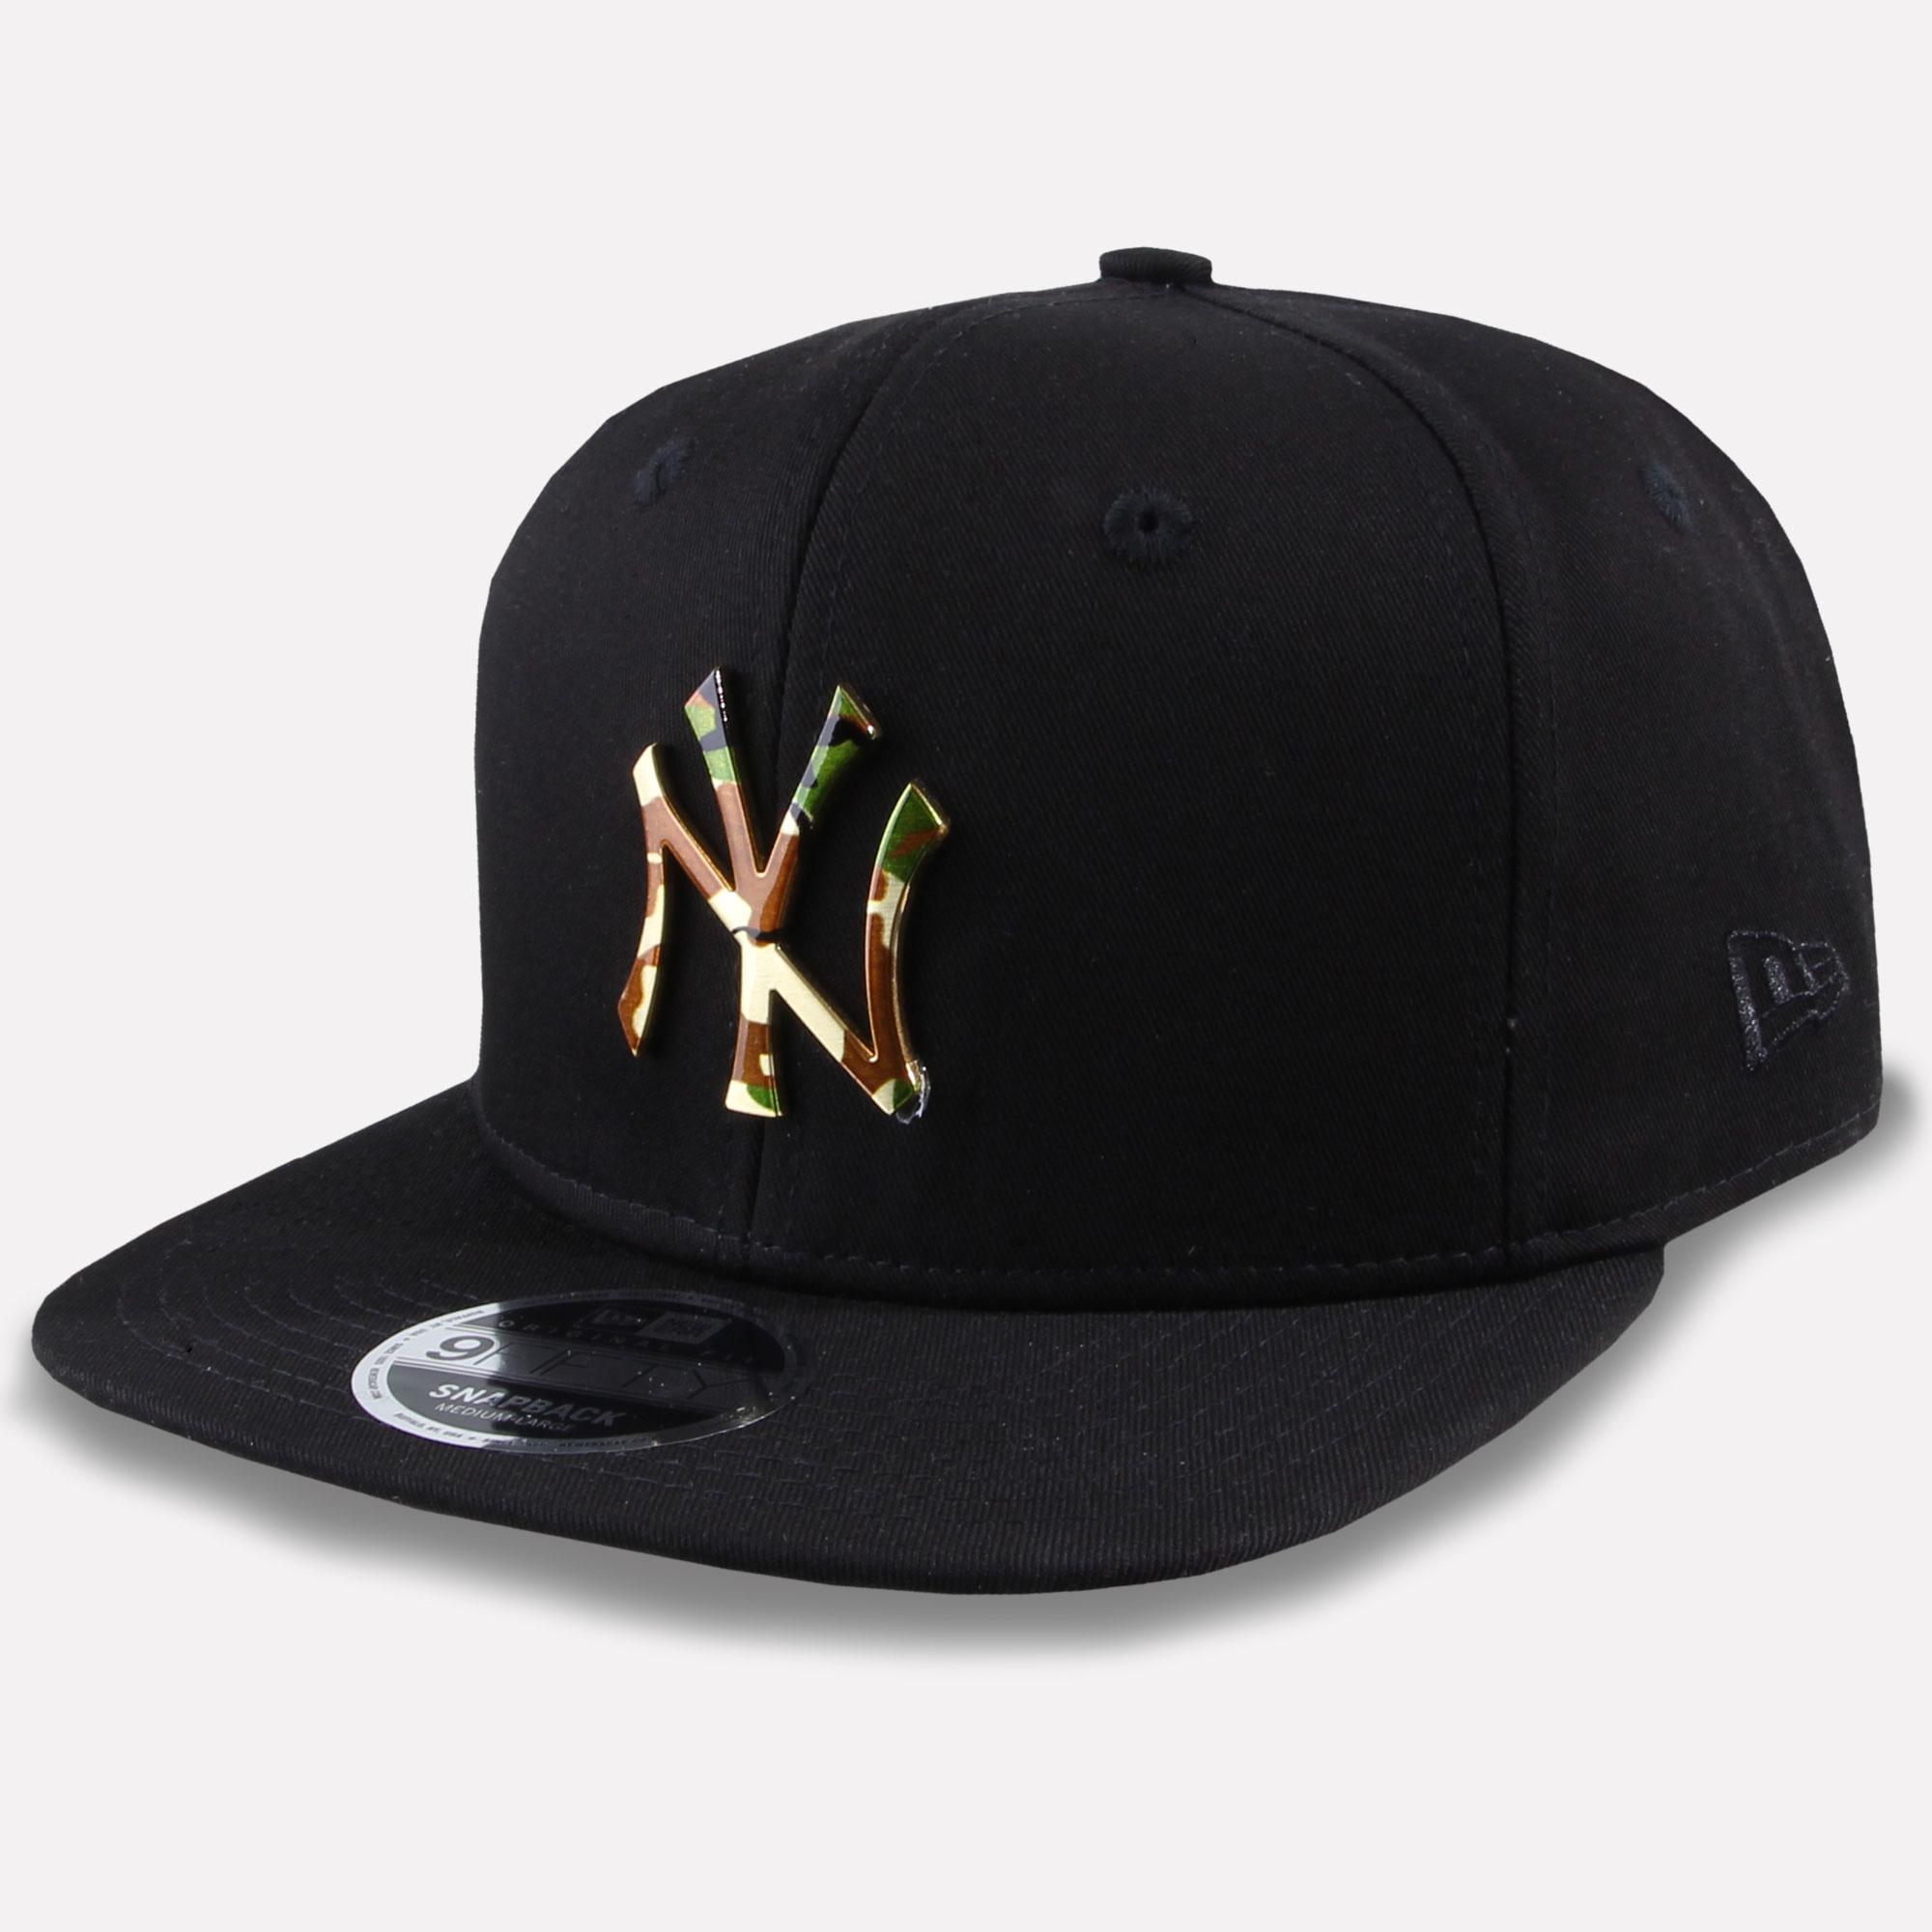 New Era 9Fifty Snapback Cap MLB Team New York Yankees Camo Metal New ... 08b4fb803616